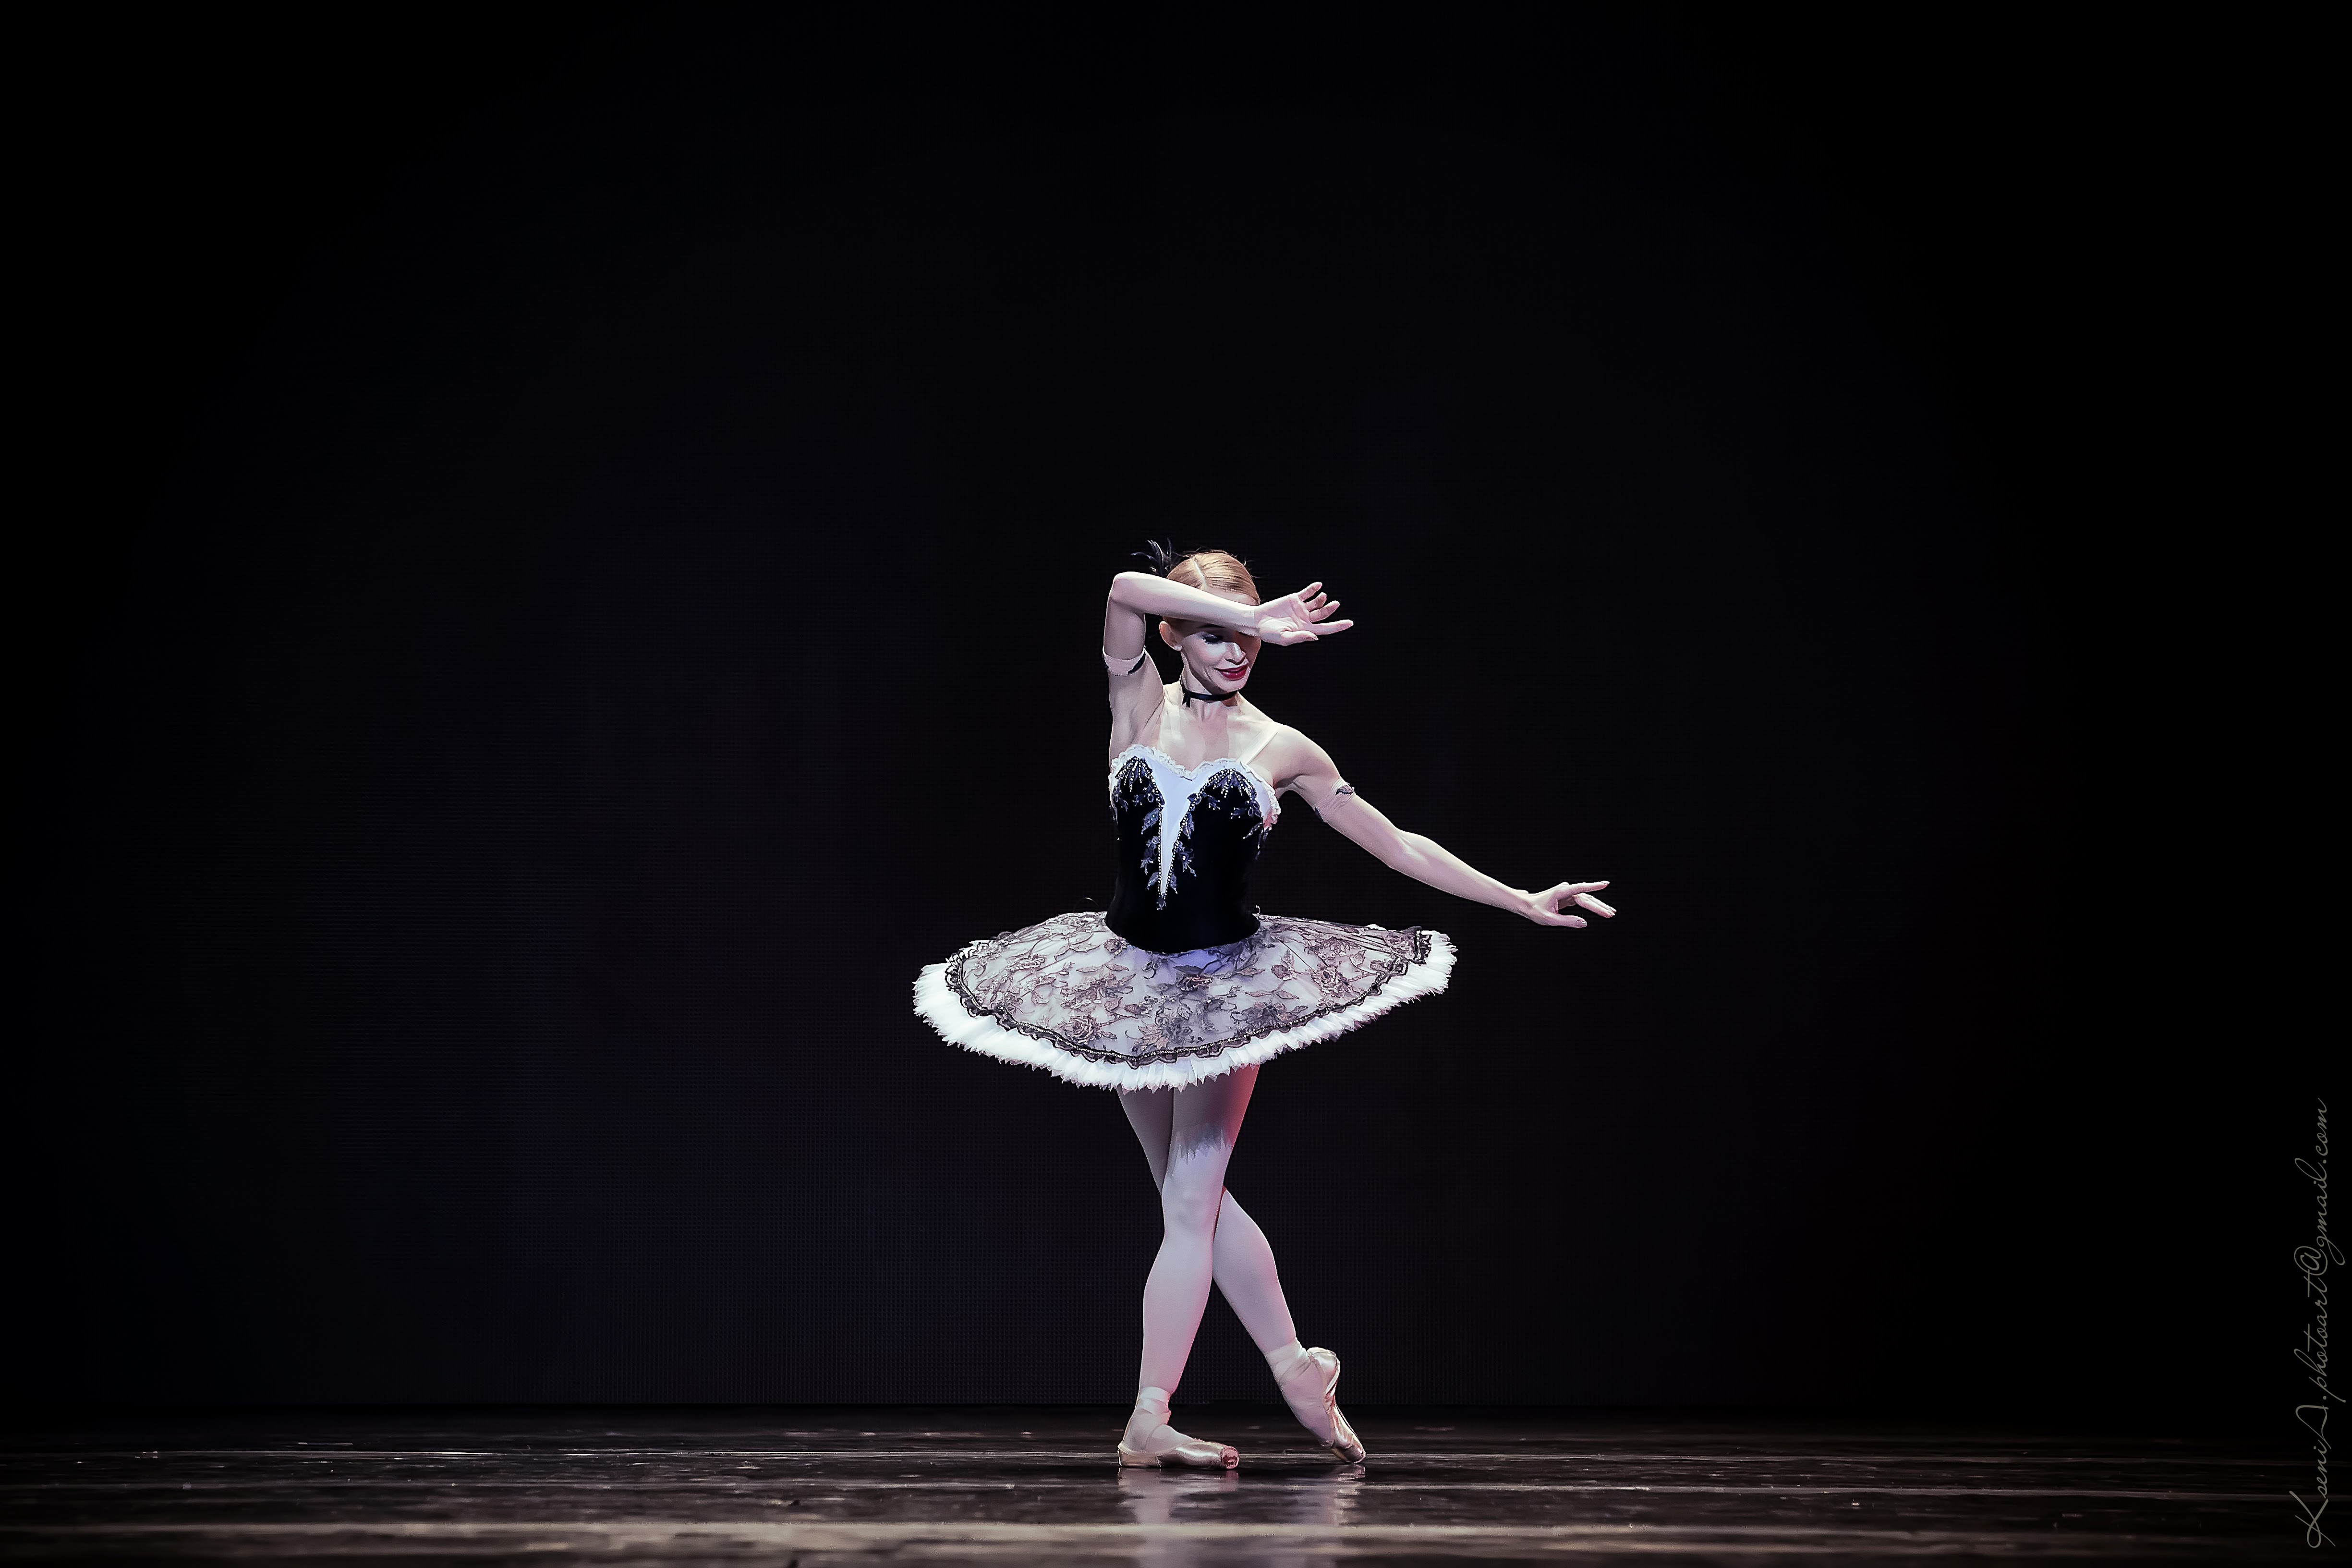 полном балерины на сцене картинки сне время